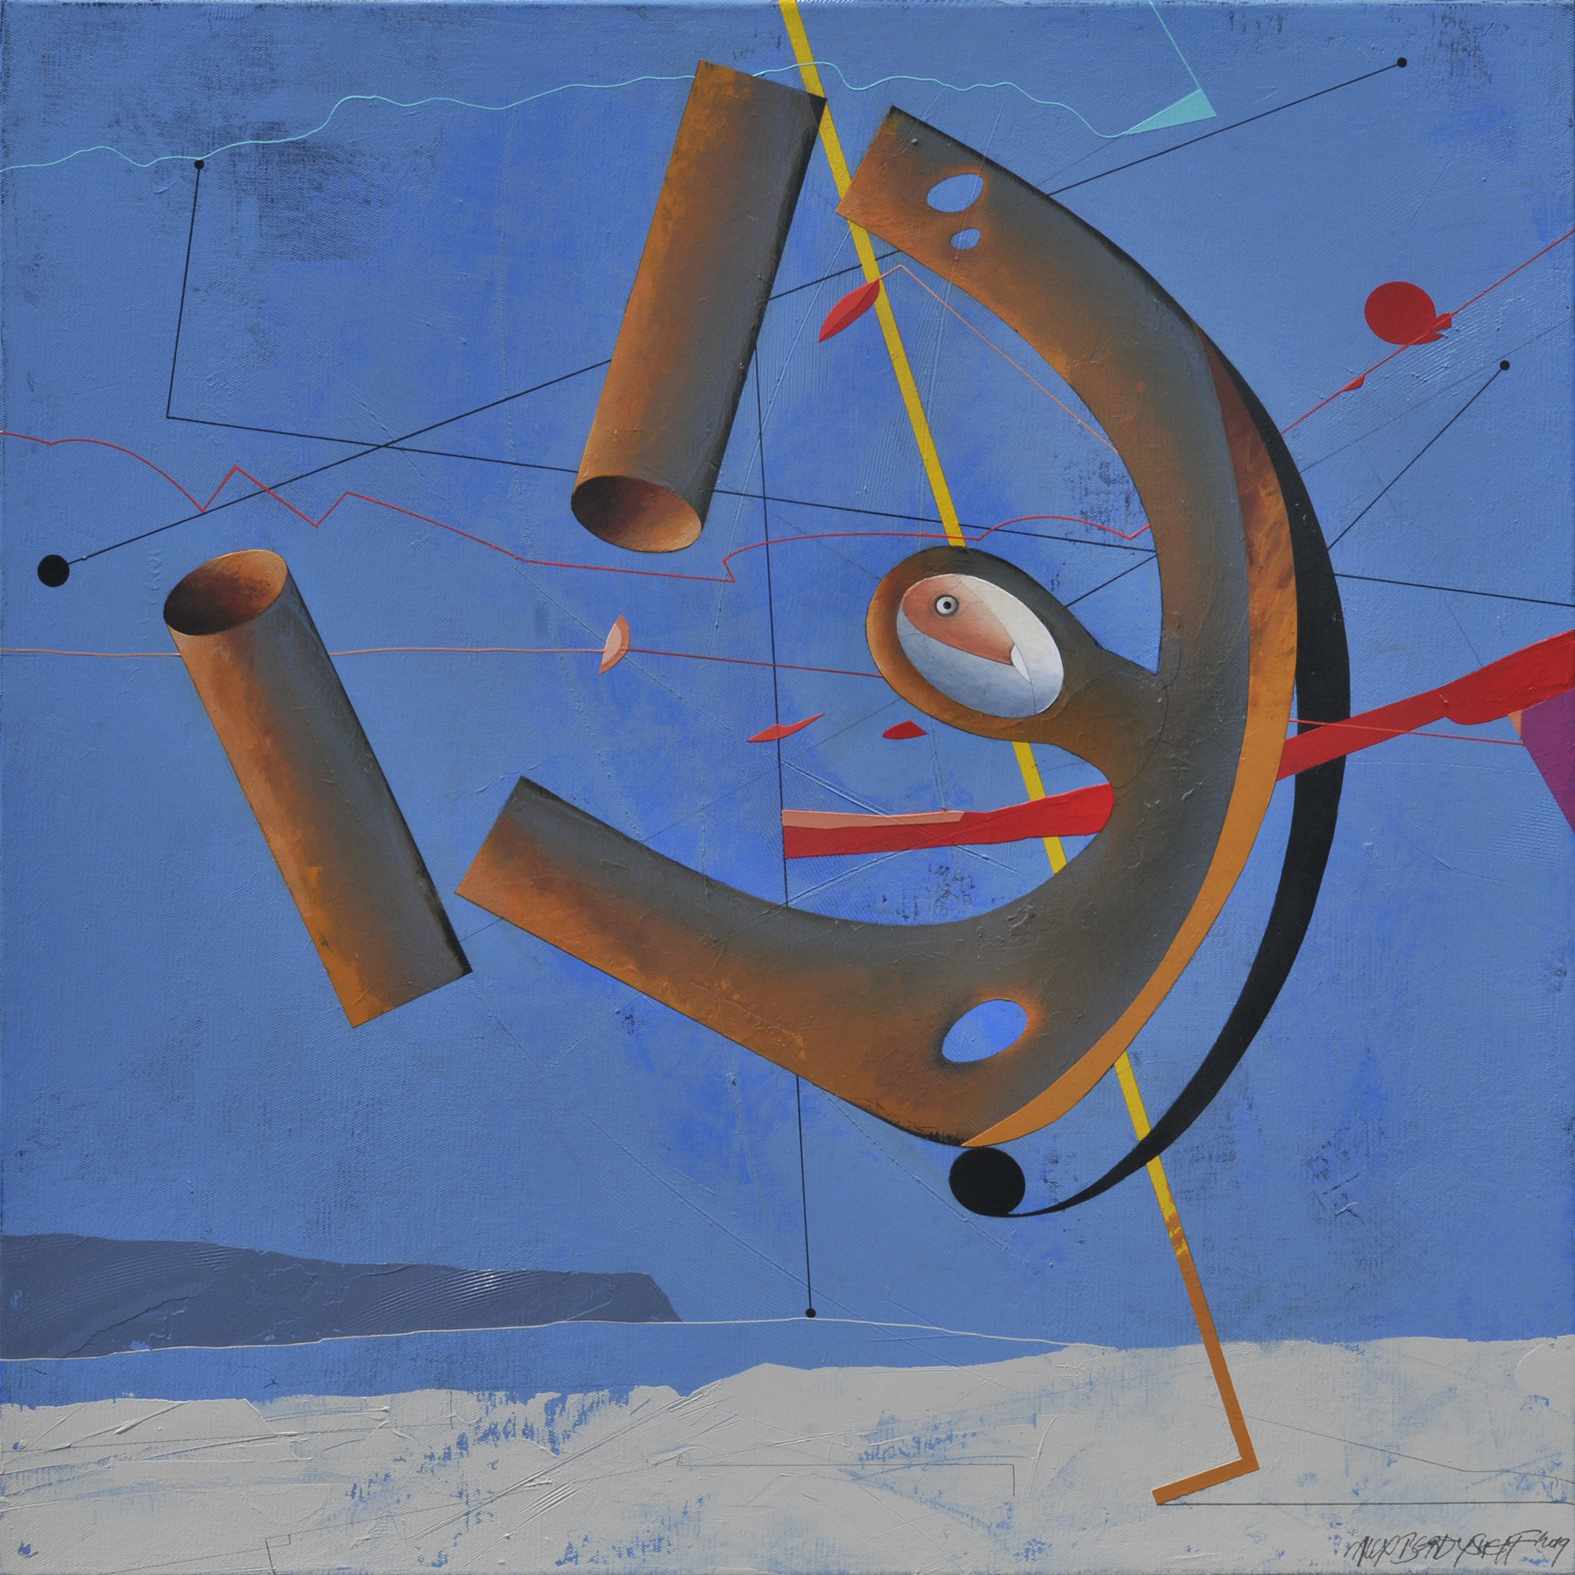 Temporary State, acrylic on canvas, 85x85 cm, 2019